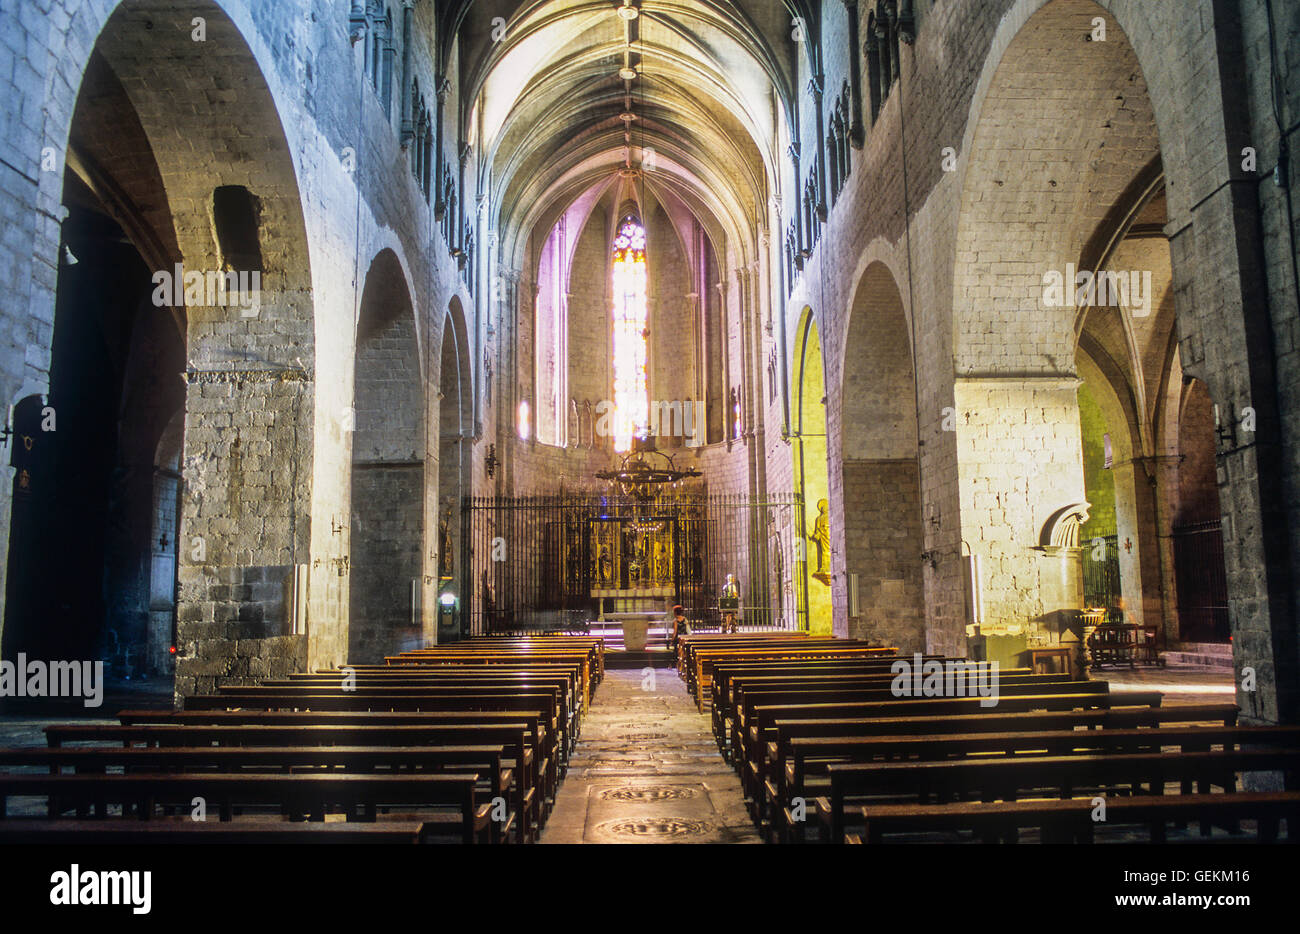 Colegiata de Sant Feliu,Girona,Catalonia, Spain. - Stock Image